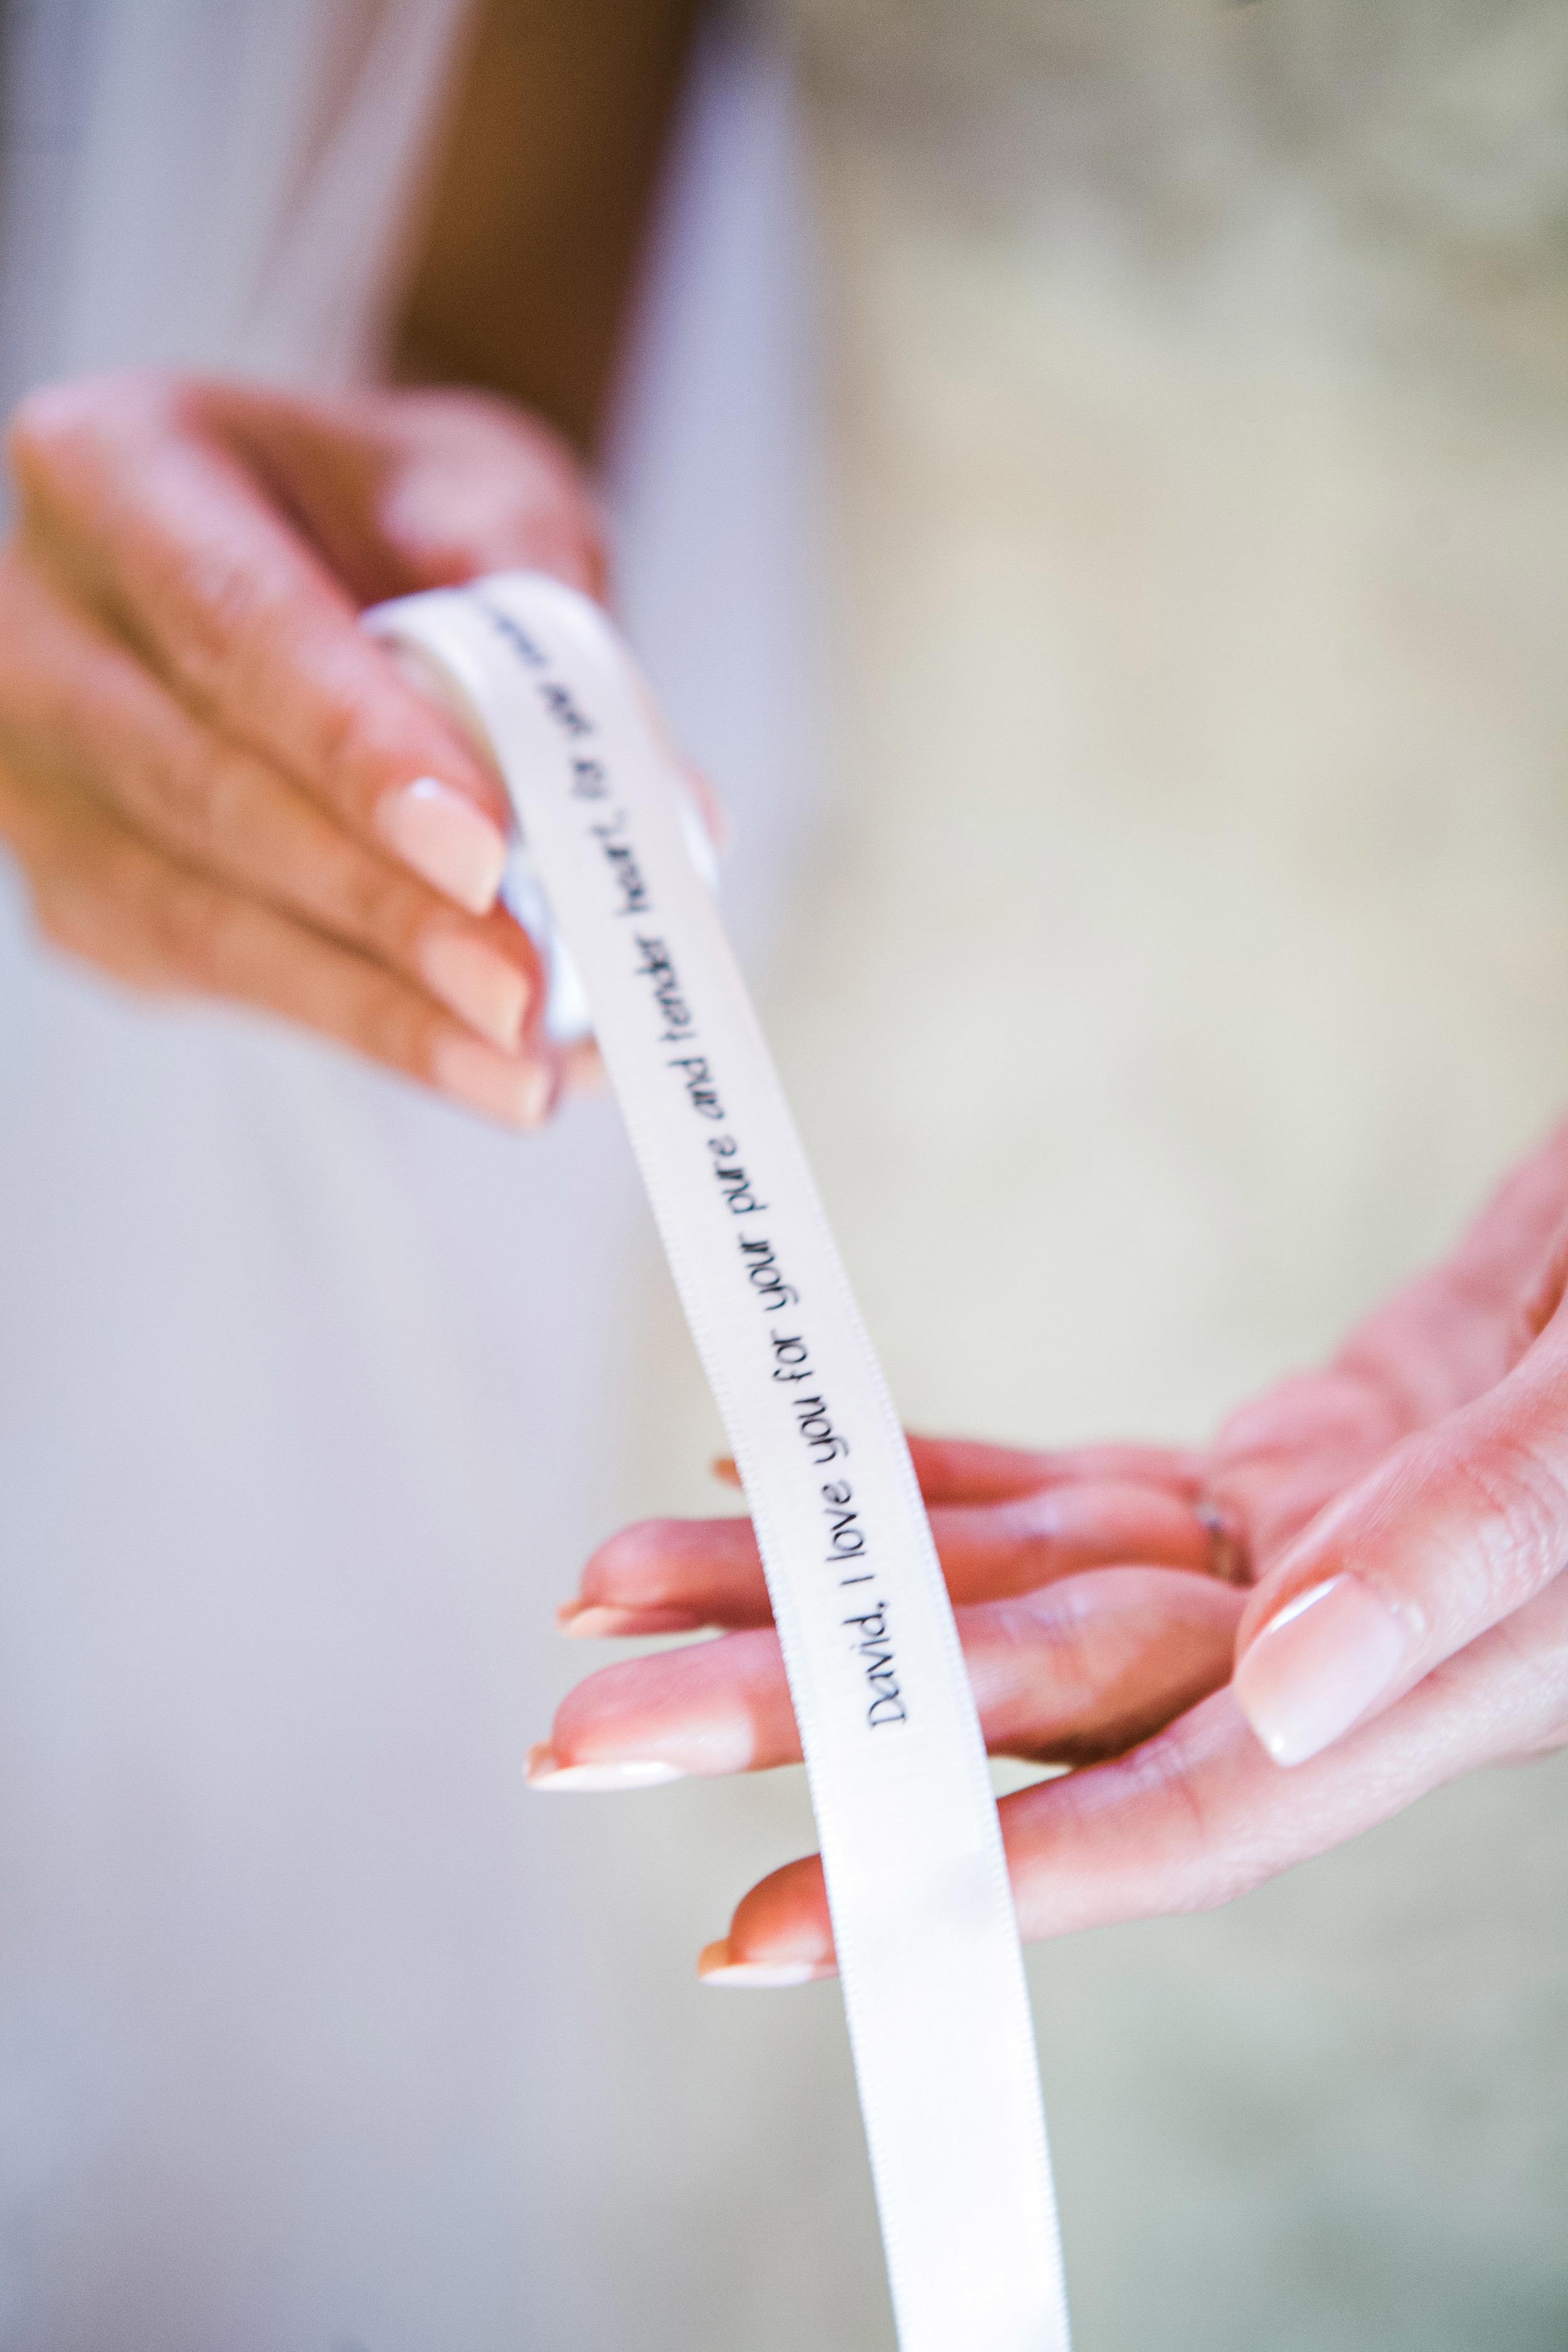 08. LS- ceremony vows, vows of ribbon, napa wedding, vineyard ceremony, ceremony vow display.jpg